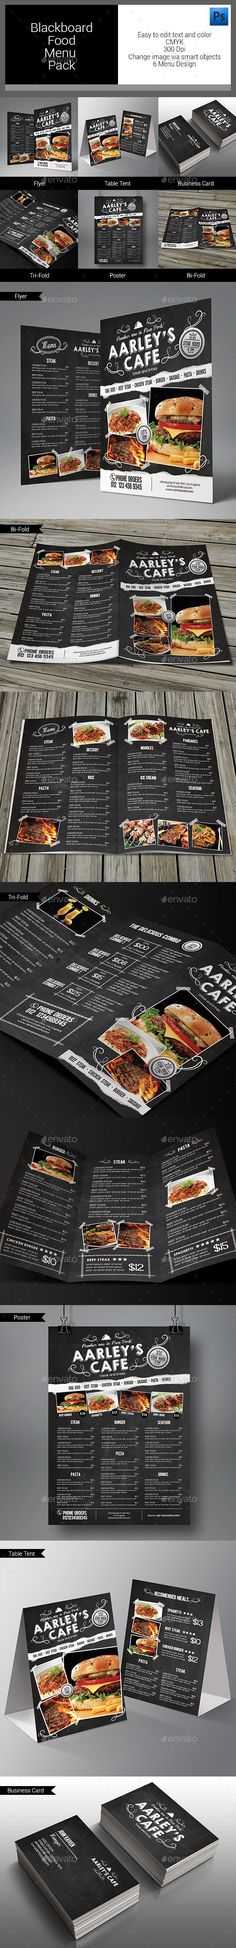 Blackboard Food Menu Bundle Template #design Download: http://graphicriver.net/item/blackboard-food-menu-bundle/11020267?ref=ksioks